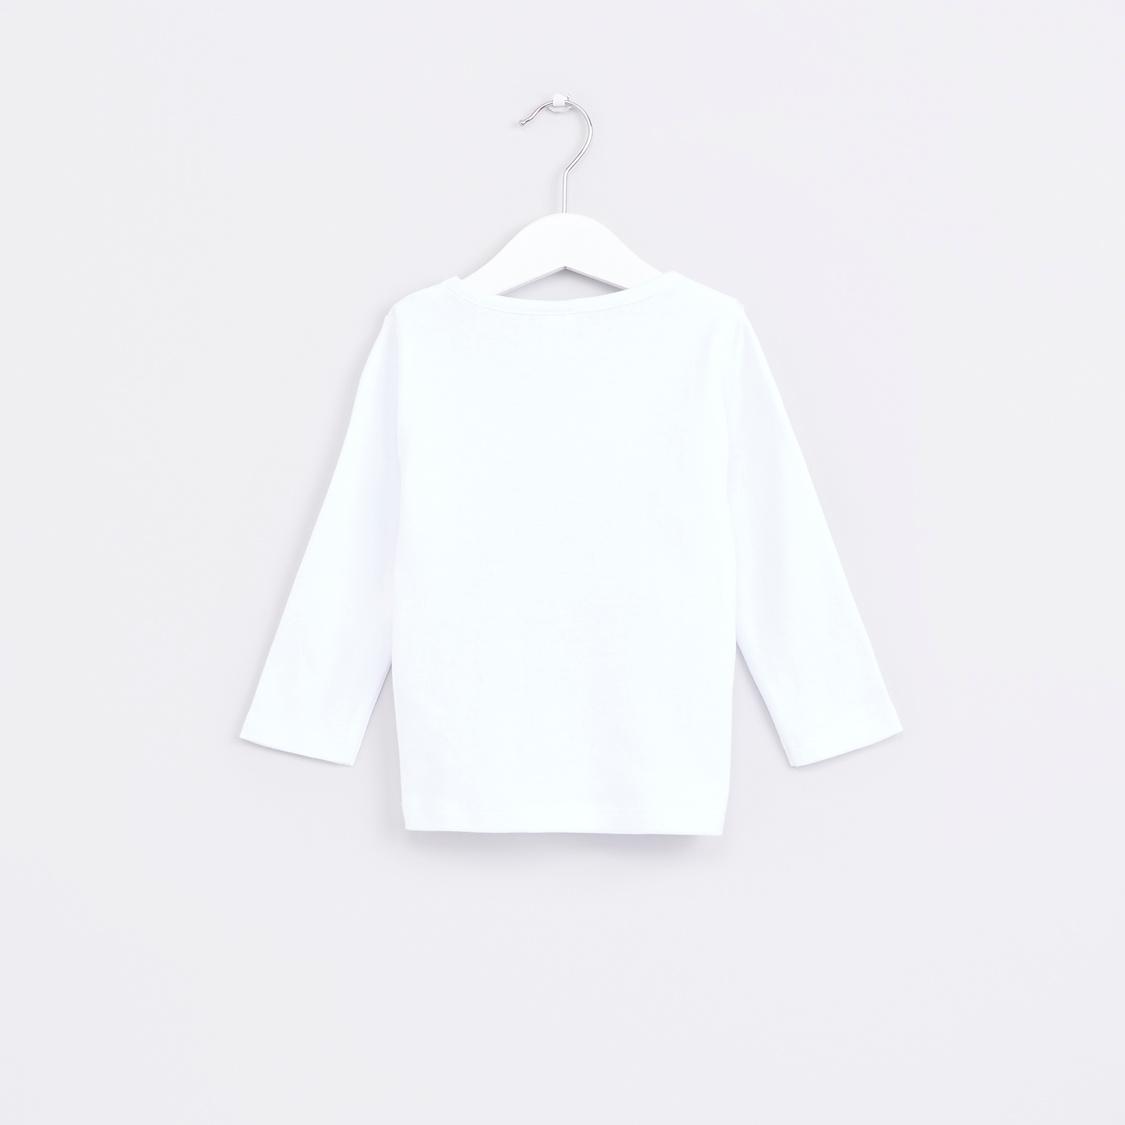 Owl Printed Long Sleeves T-Shirt with Jog Pants